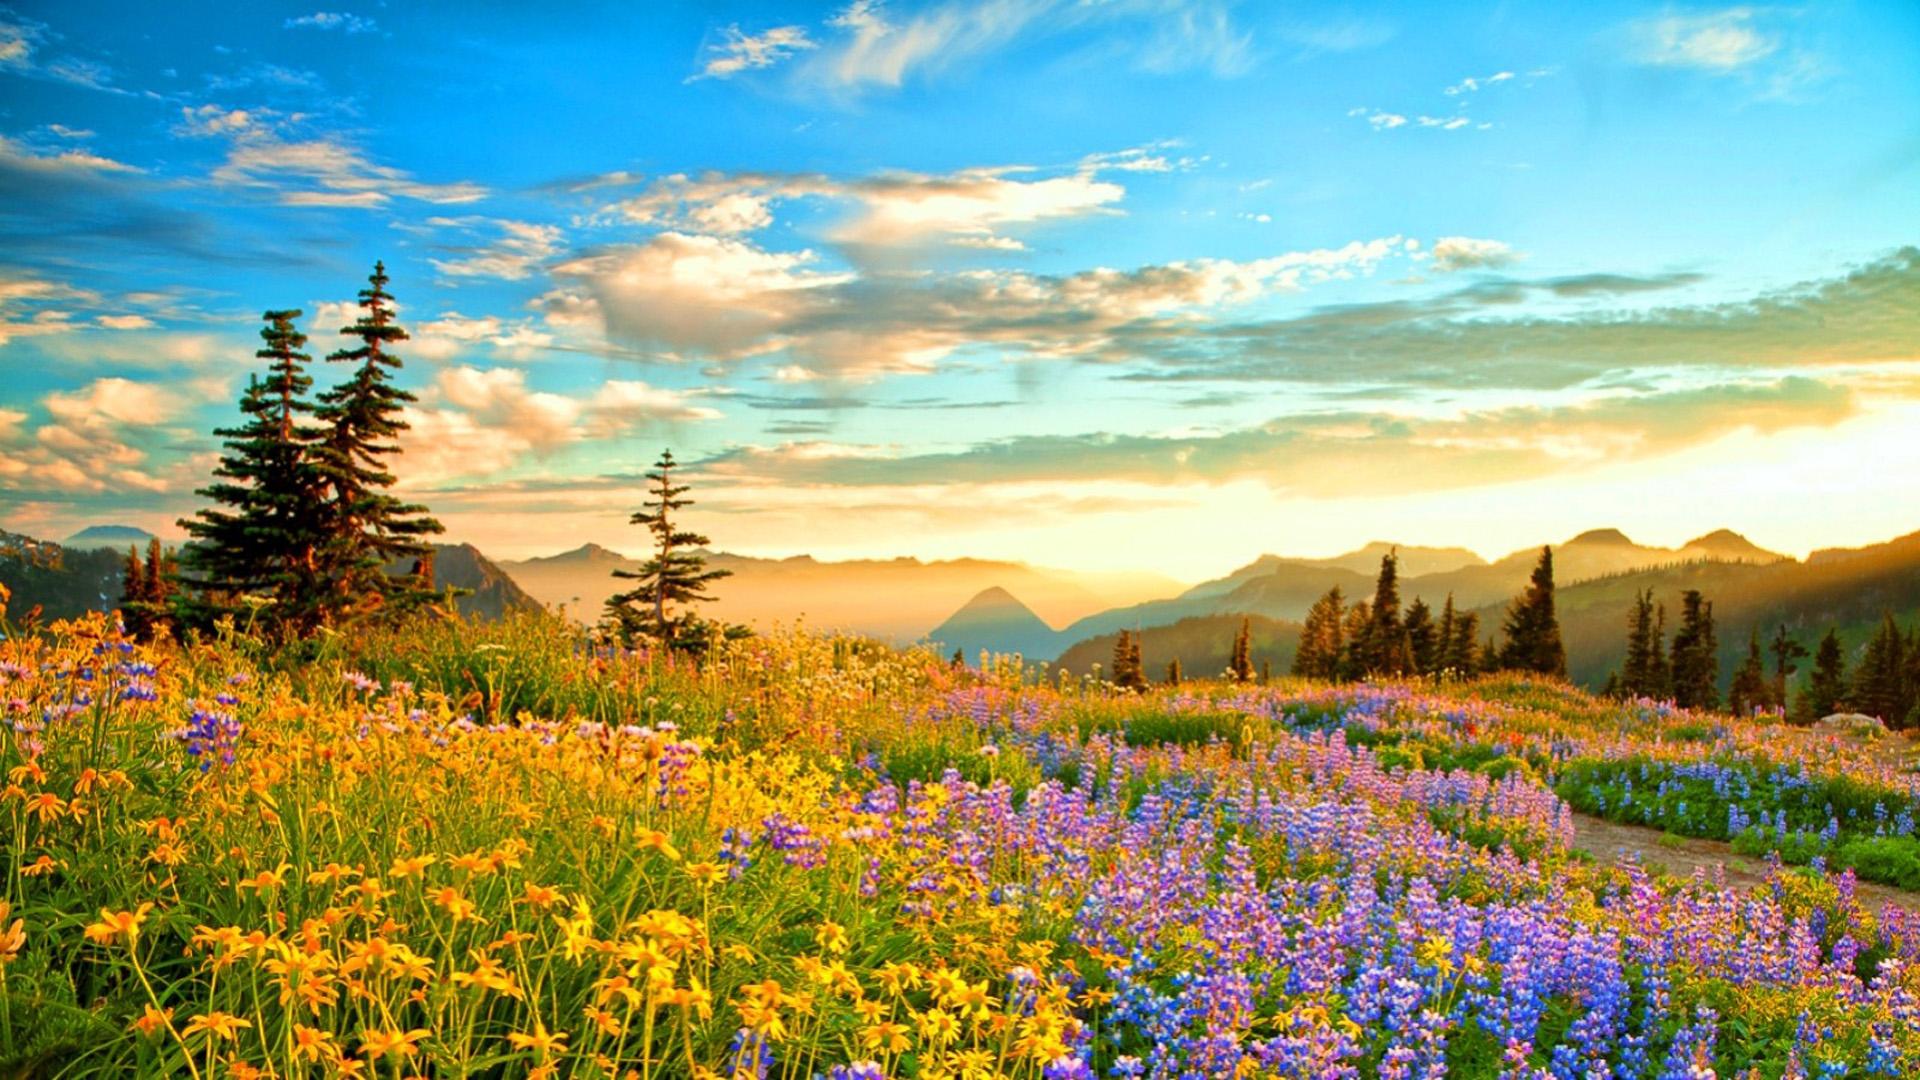 Fall Of Gods Wallpaper Sunset Mountain Wilderness France Spring Mountain Flowers